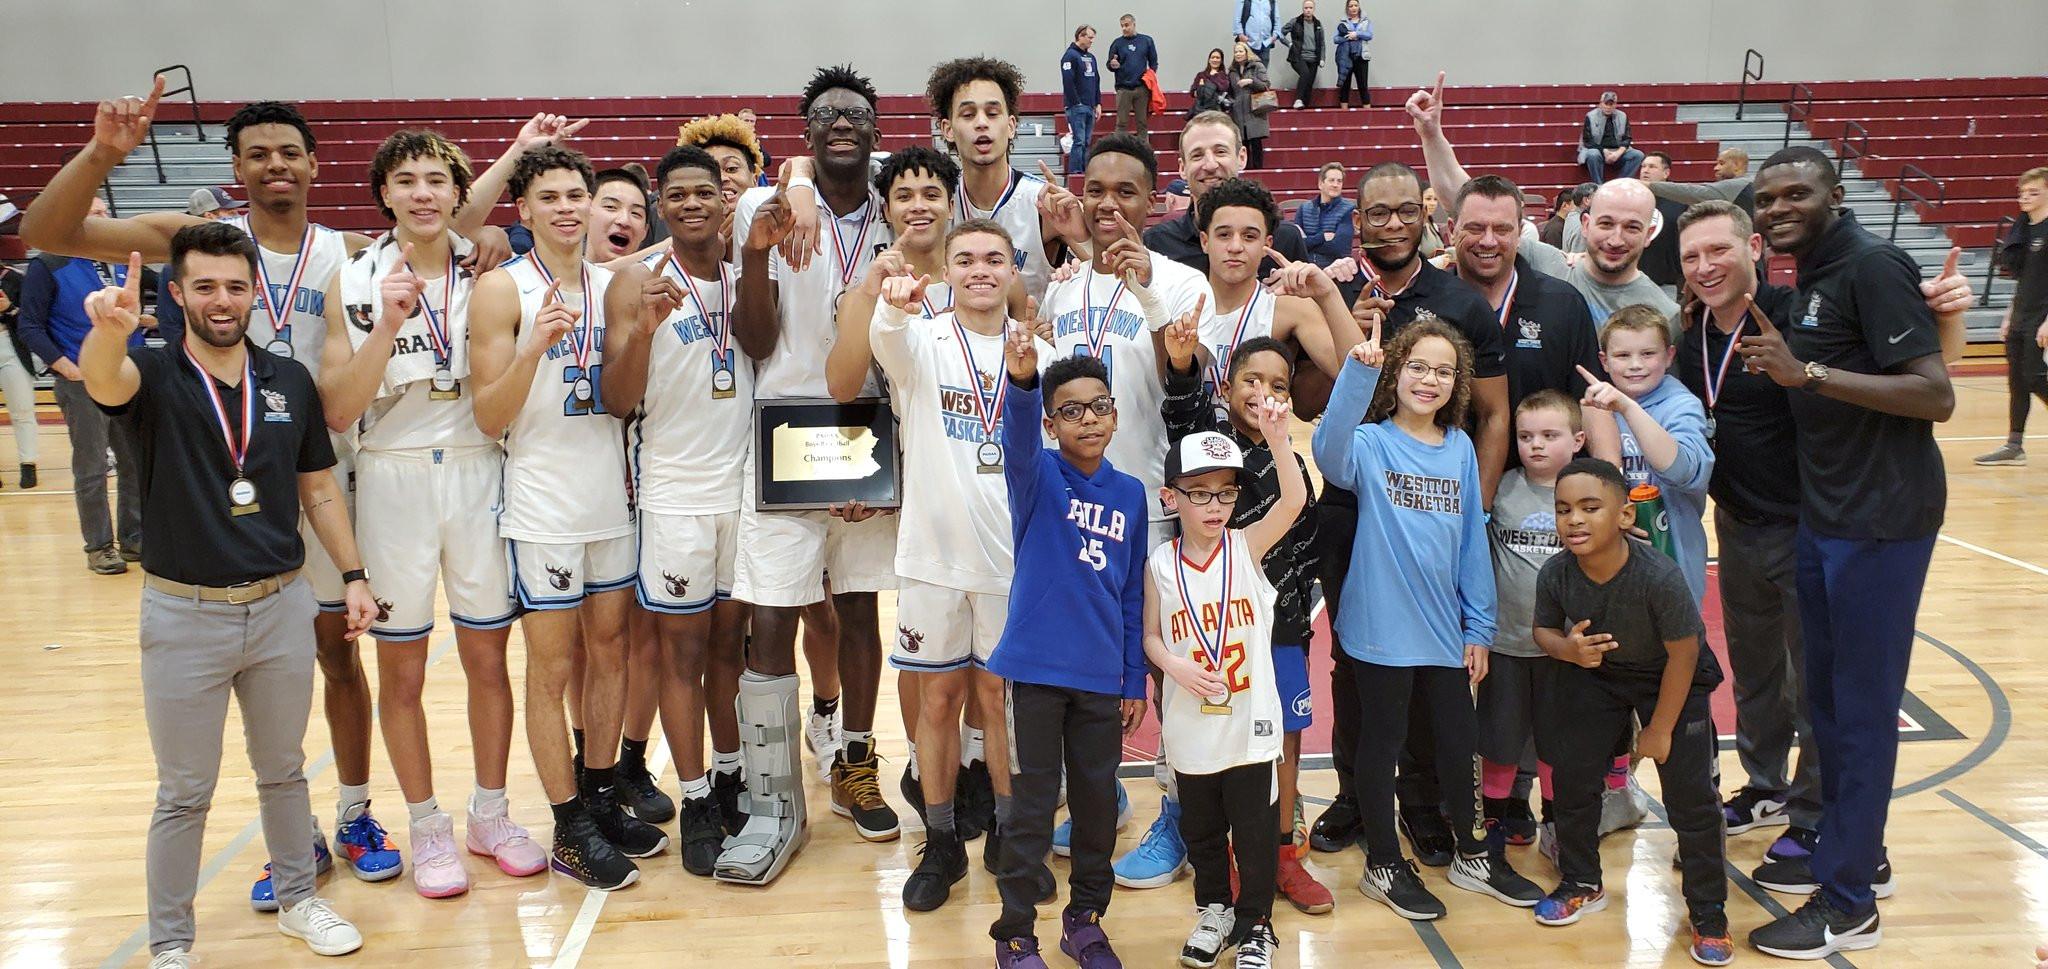 Westtown Boys Basketball 2019-20